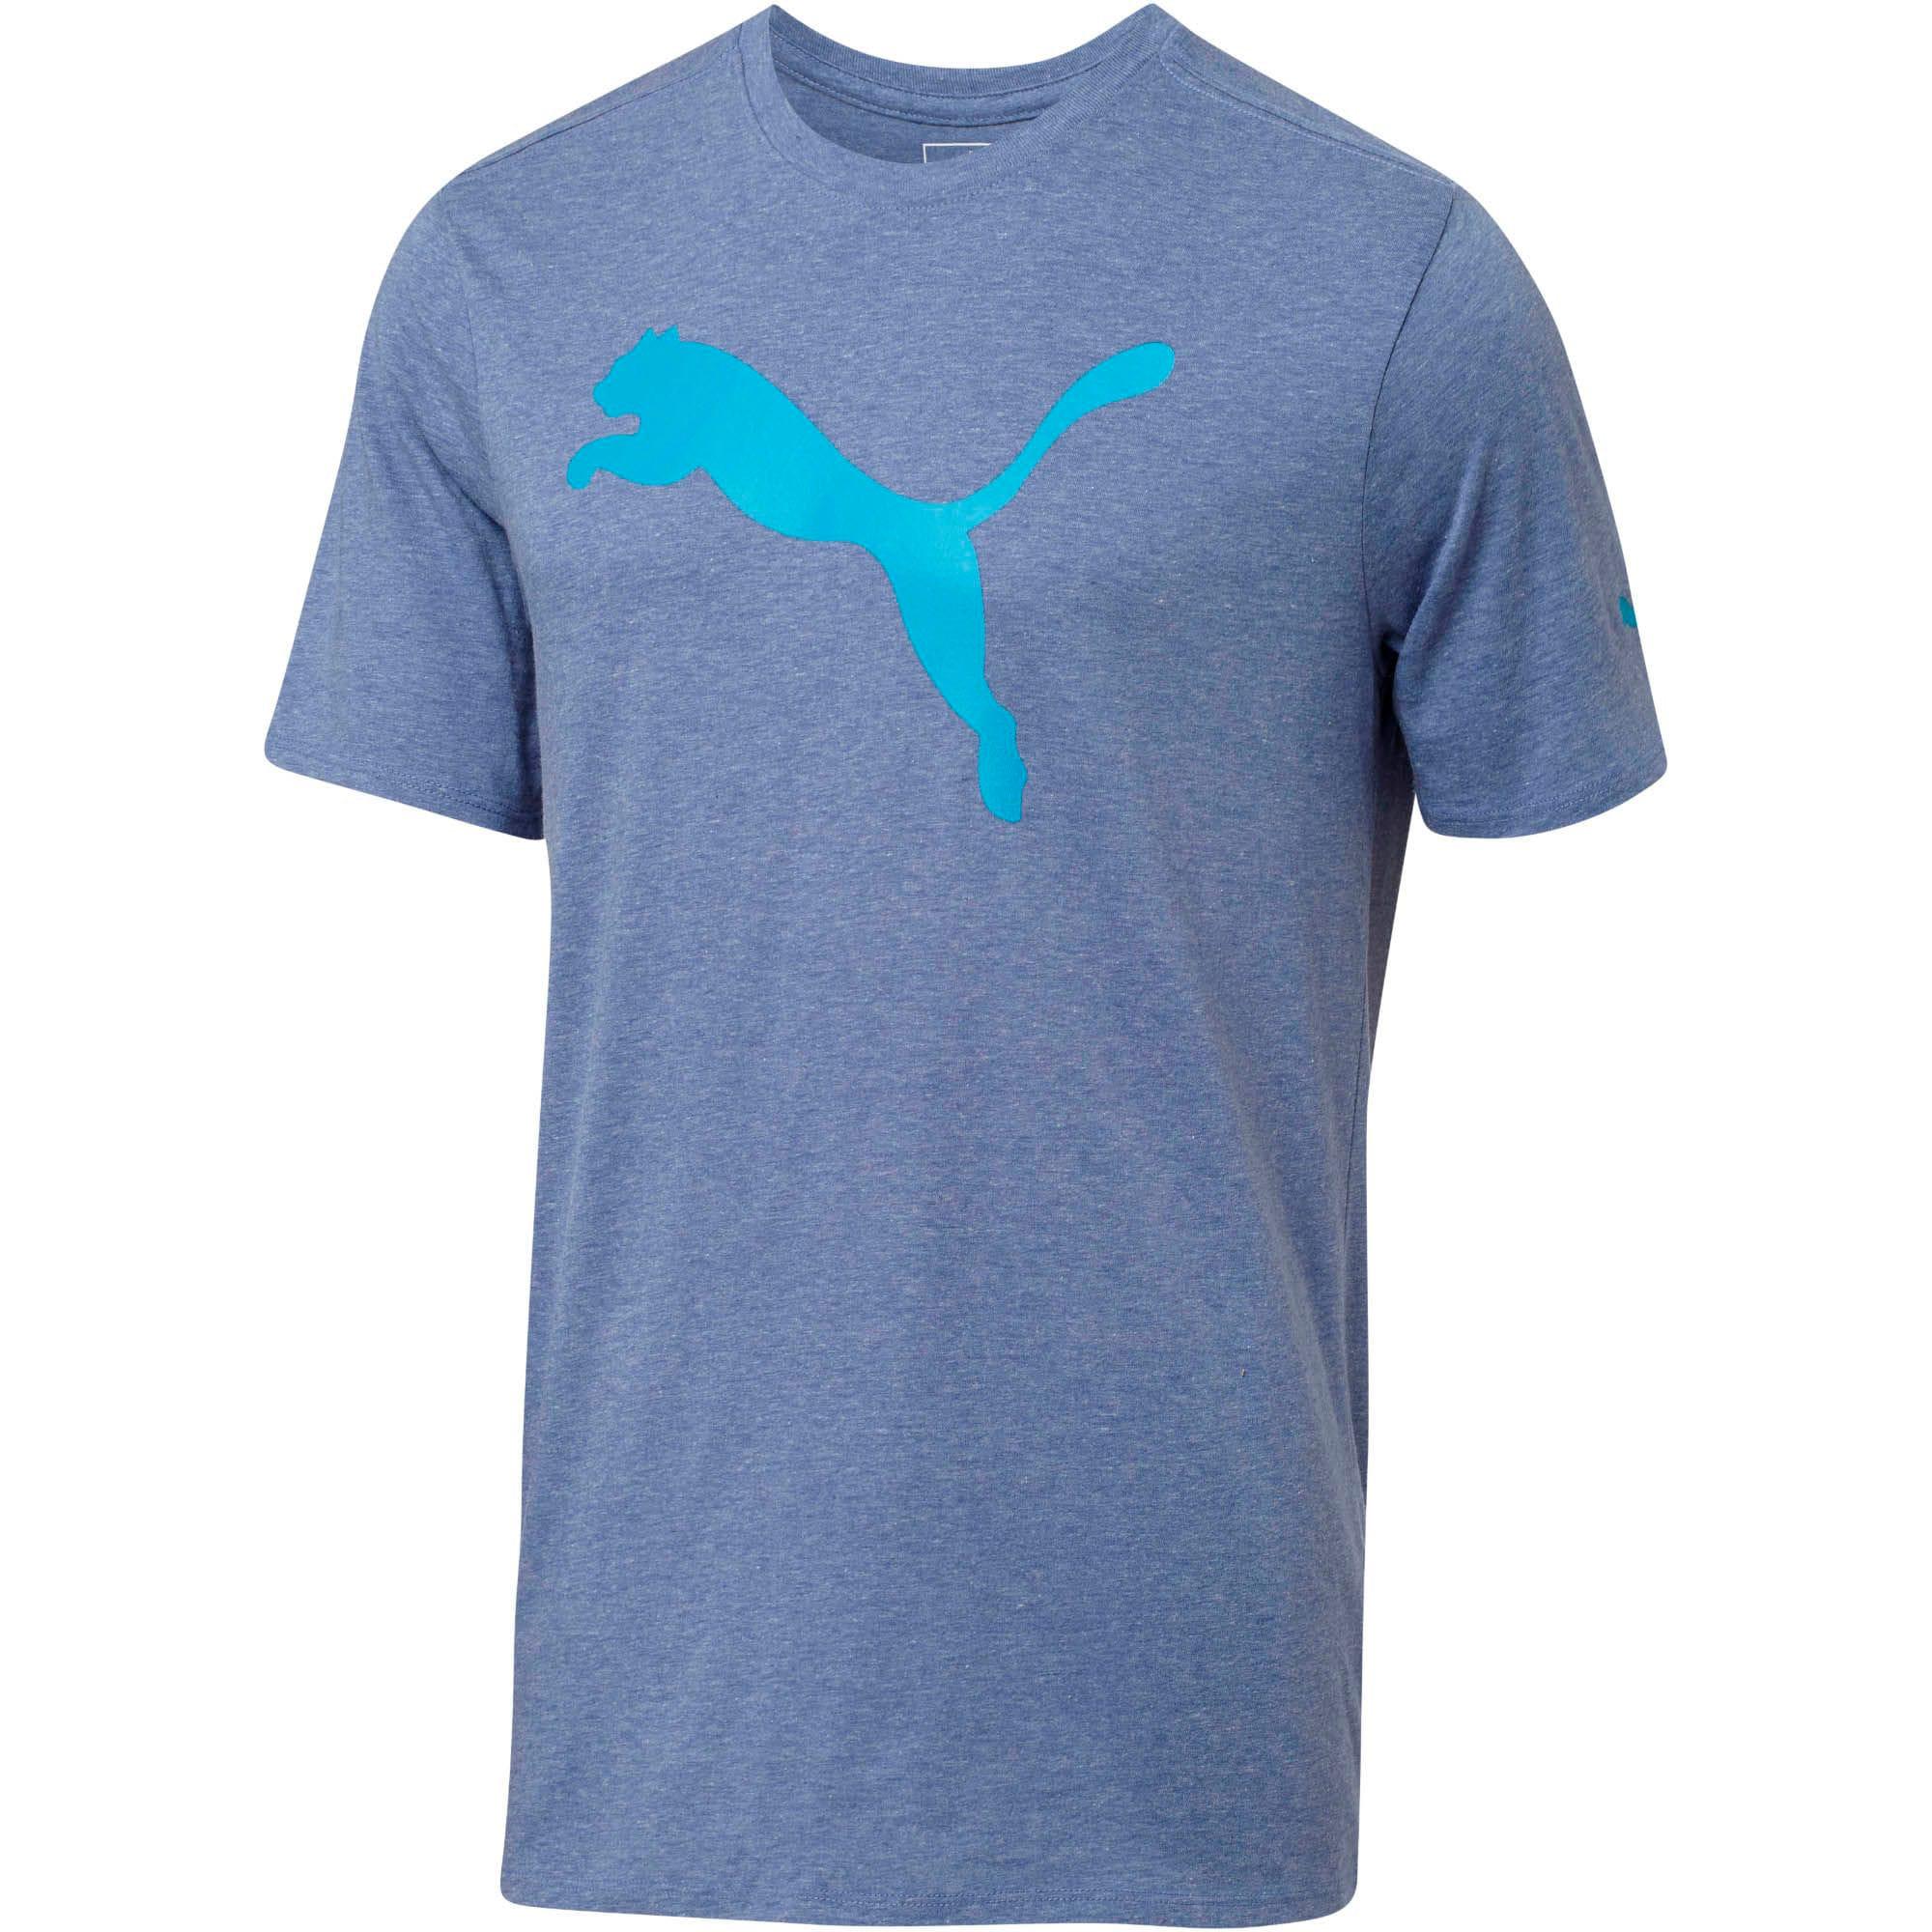 Thumbnail 1 of Big Cat Graphic T-Shirt, TRUE BLUE Heather, medium